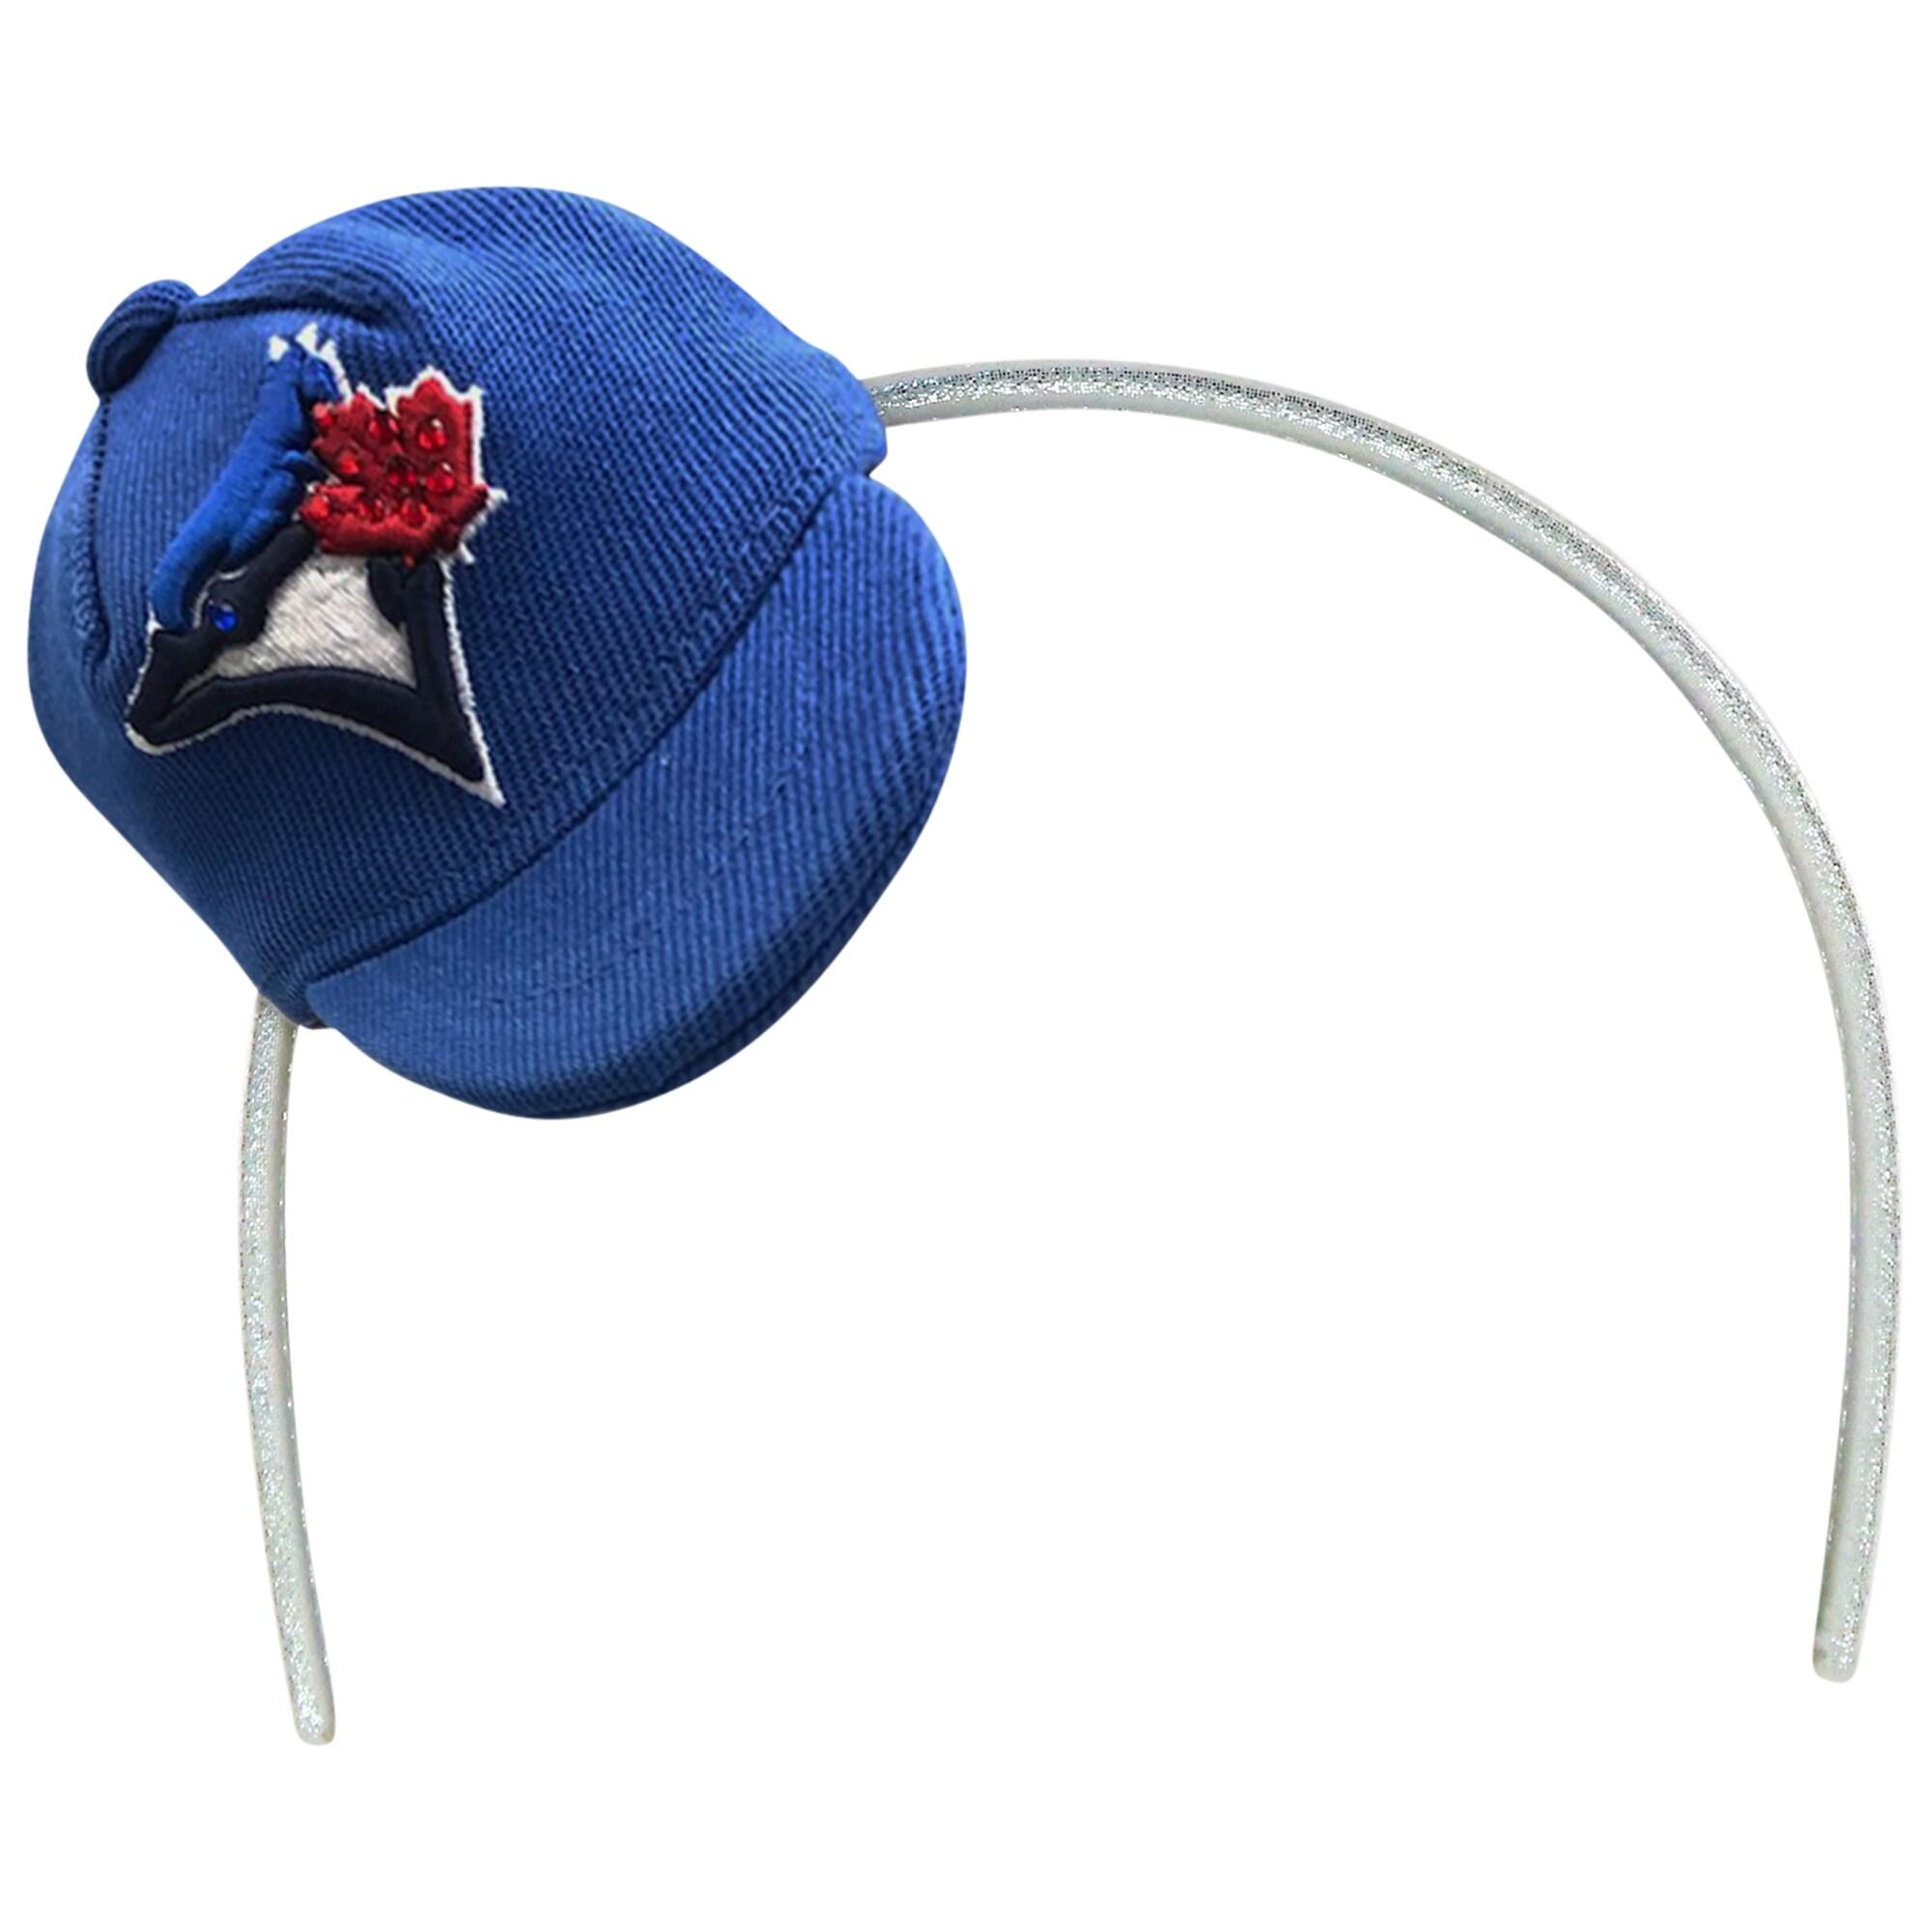 Toronto Blue Jays Women's Team Toppers Rhinestone Headband - Blue